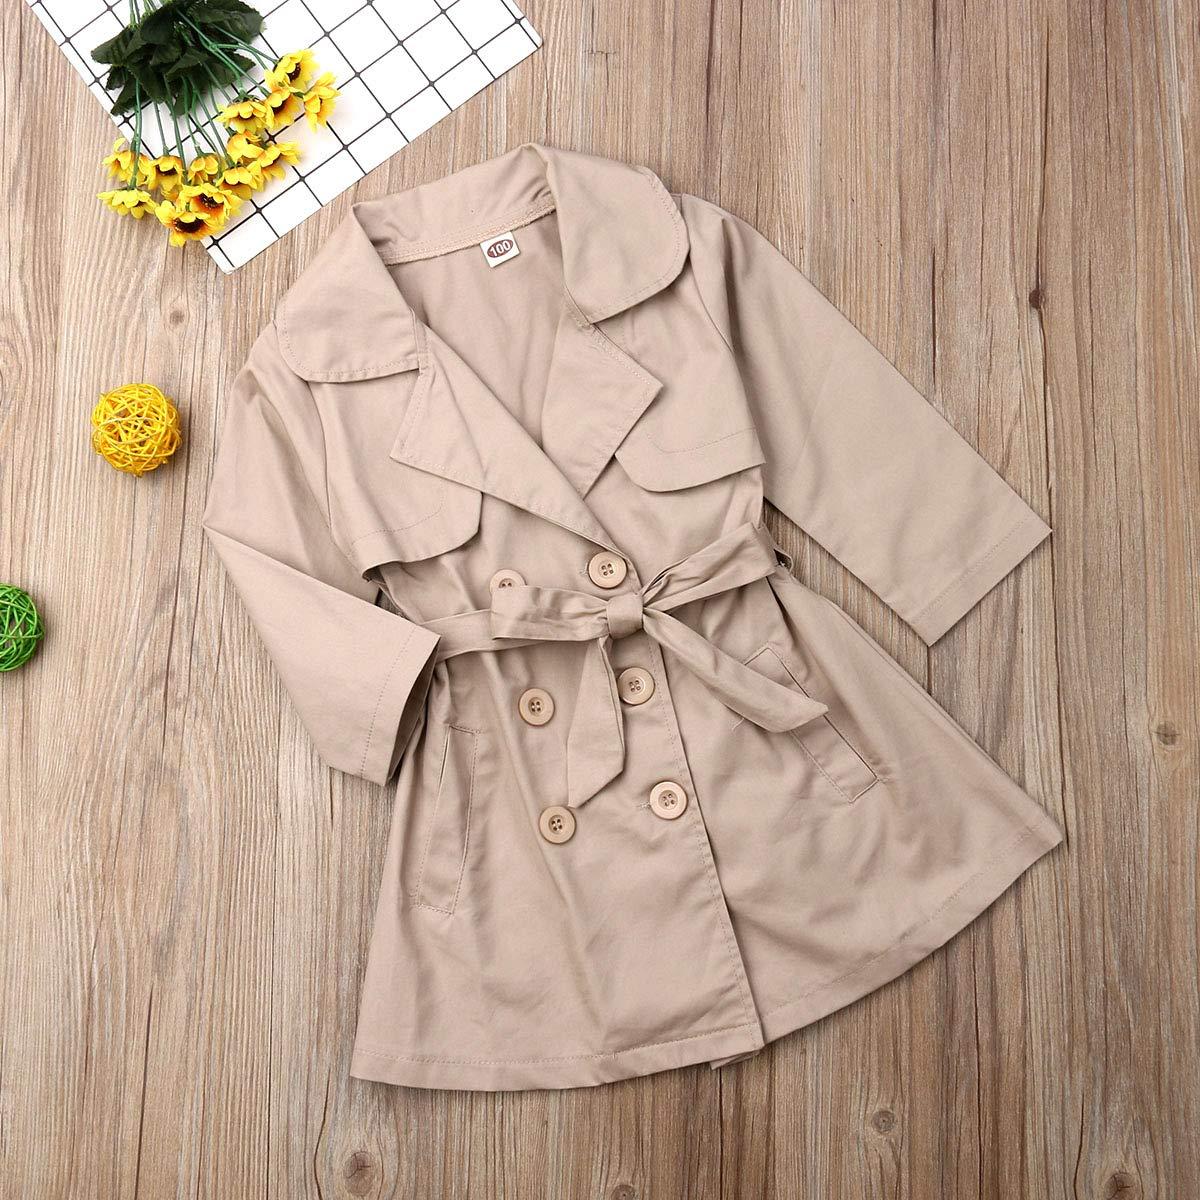 Dcohmch Toddler Baby Girl Trench Coat Girl Kids Spring Autumn Long Sleeve Wind Coat Windbreaker Jacket Casual Outerwear Coat